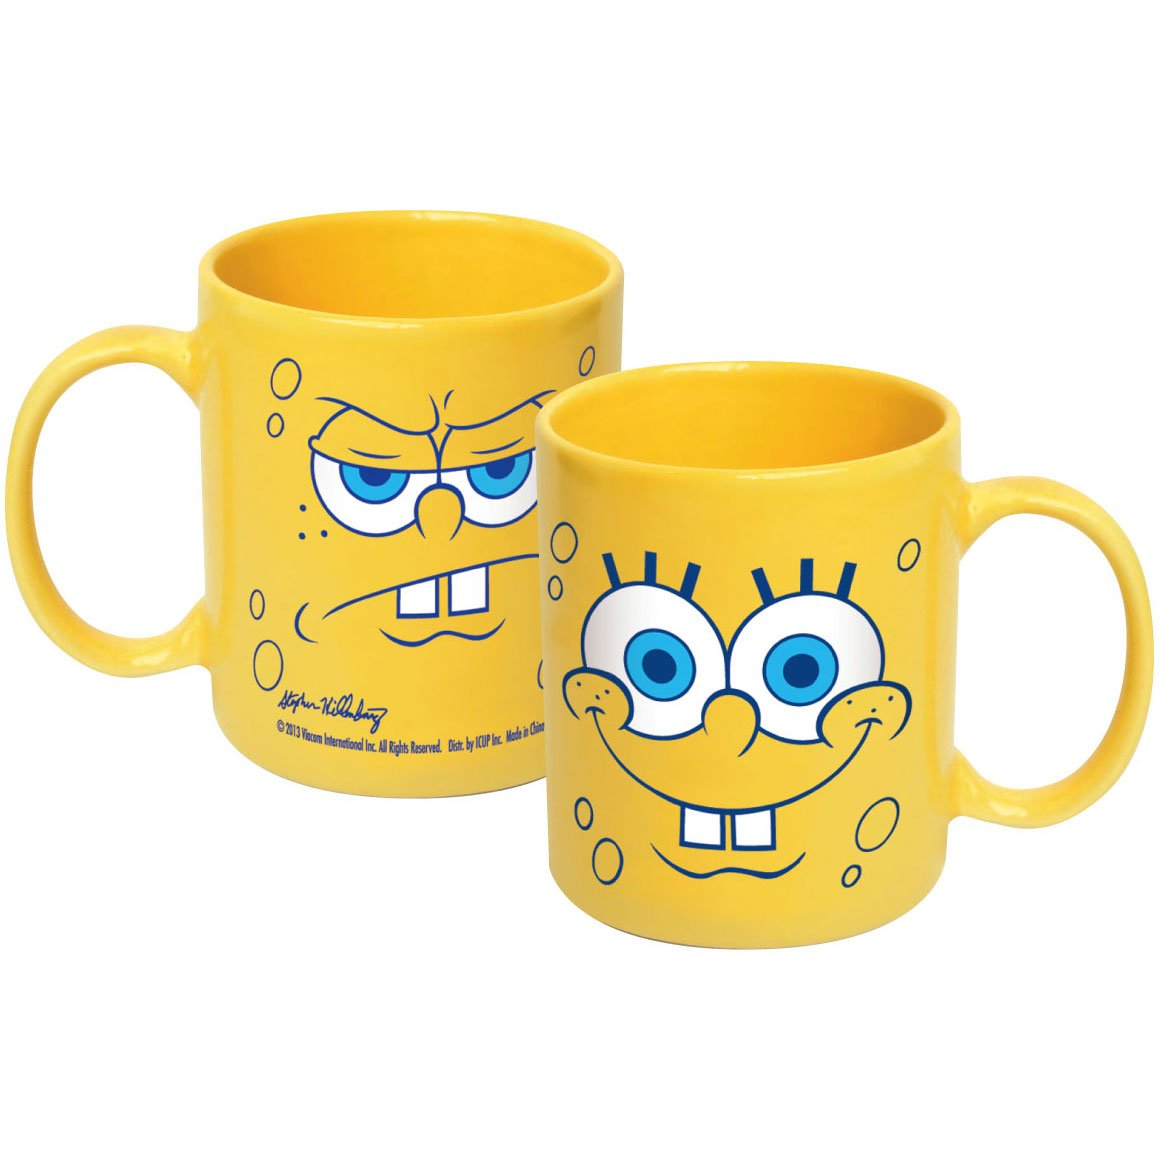 ICUP Spongebob Big Faces Ceramic Mug, 20 oz, Clear by ICUP (Image #1)